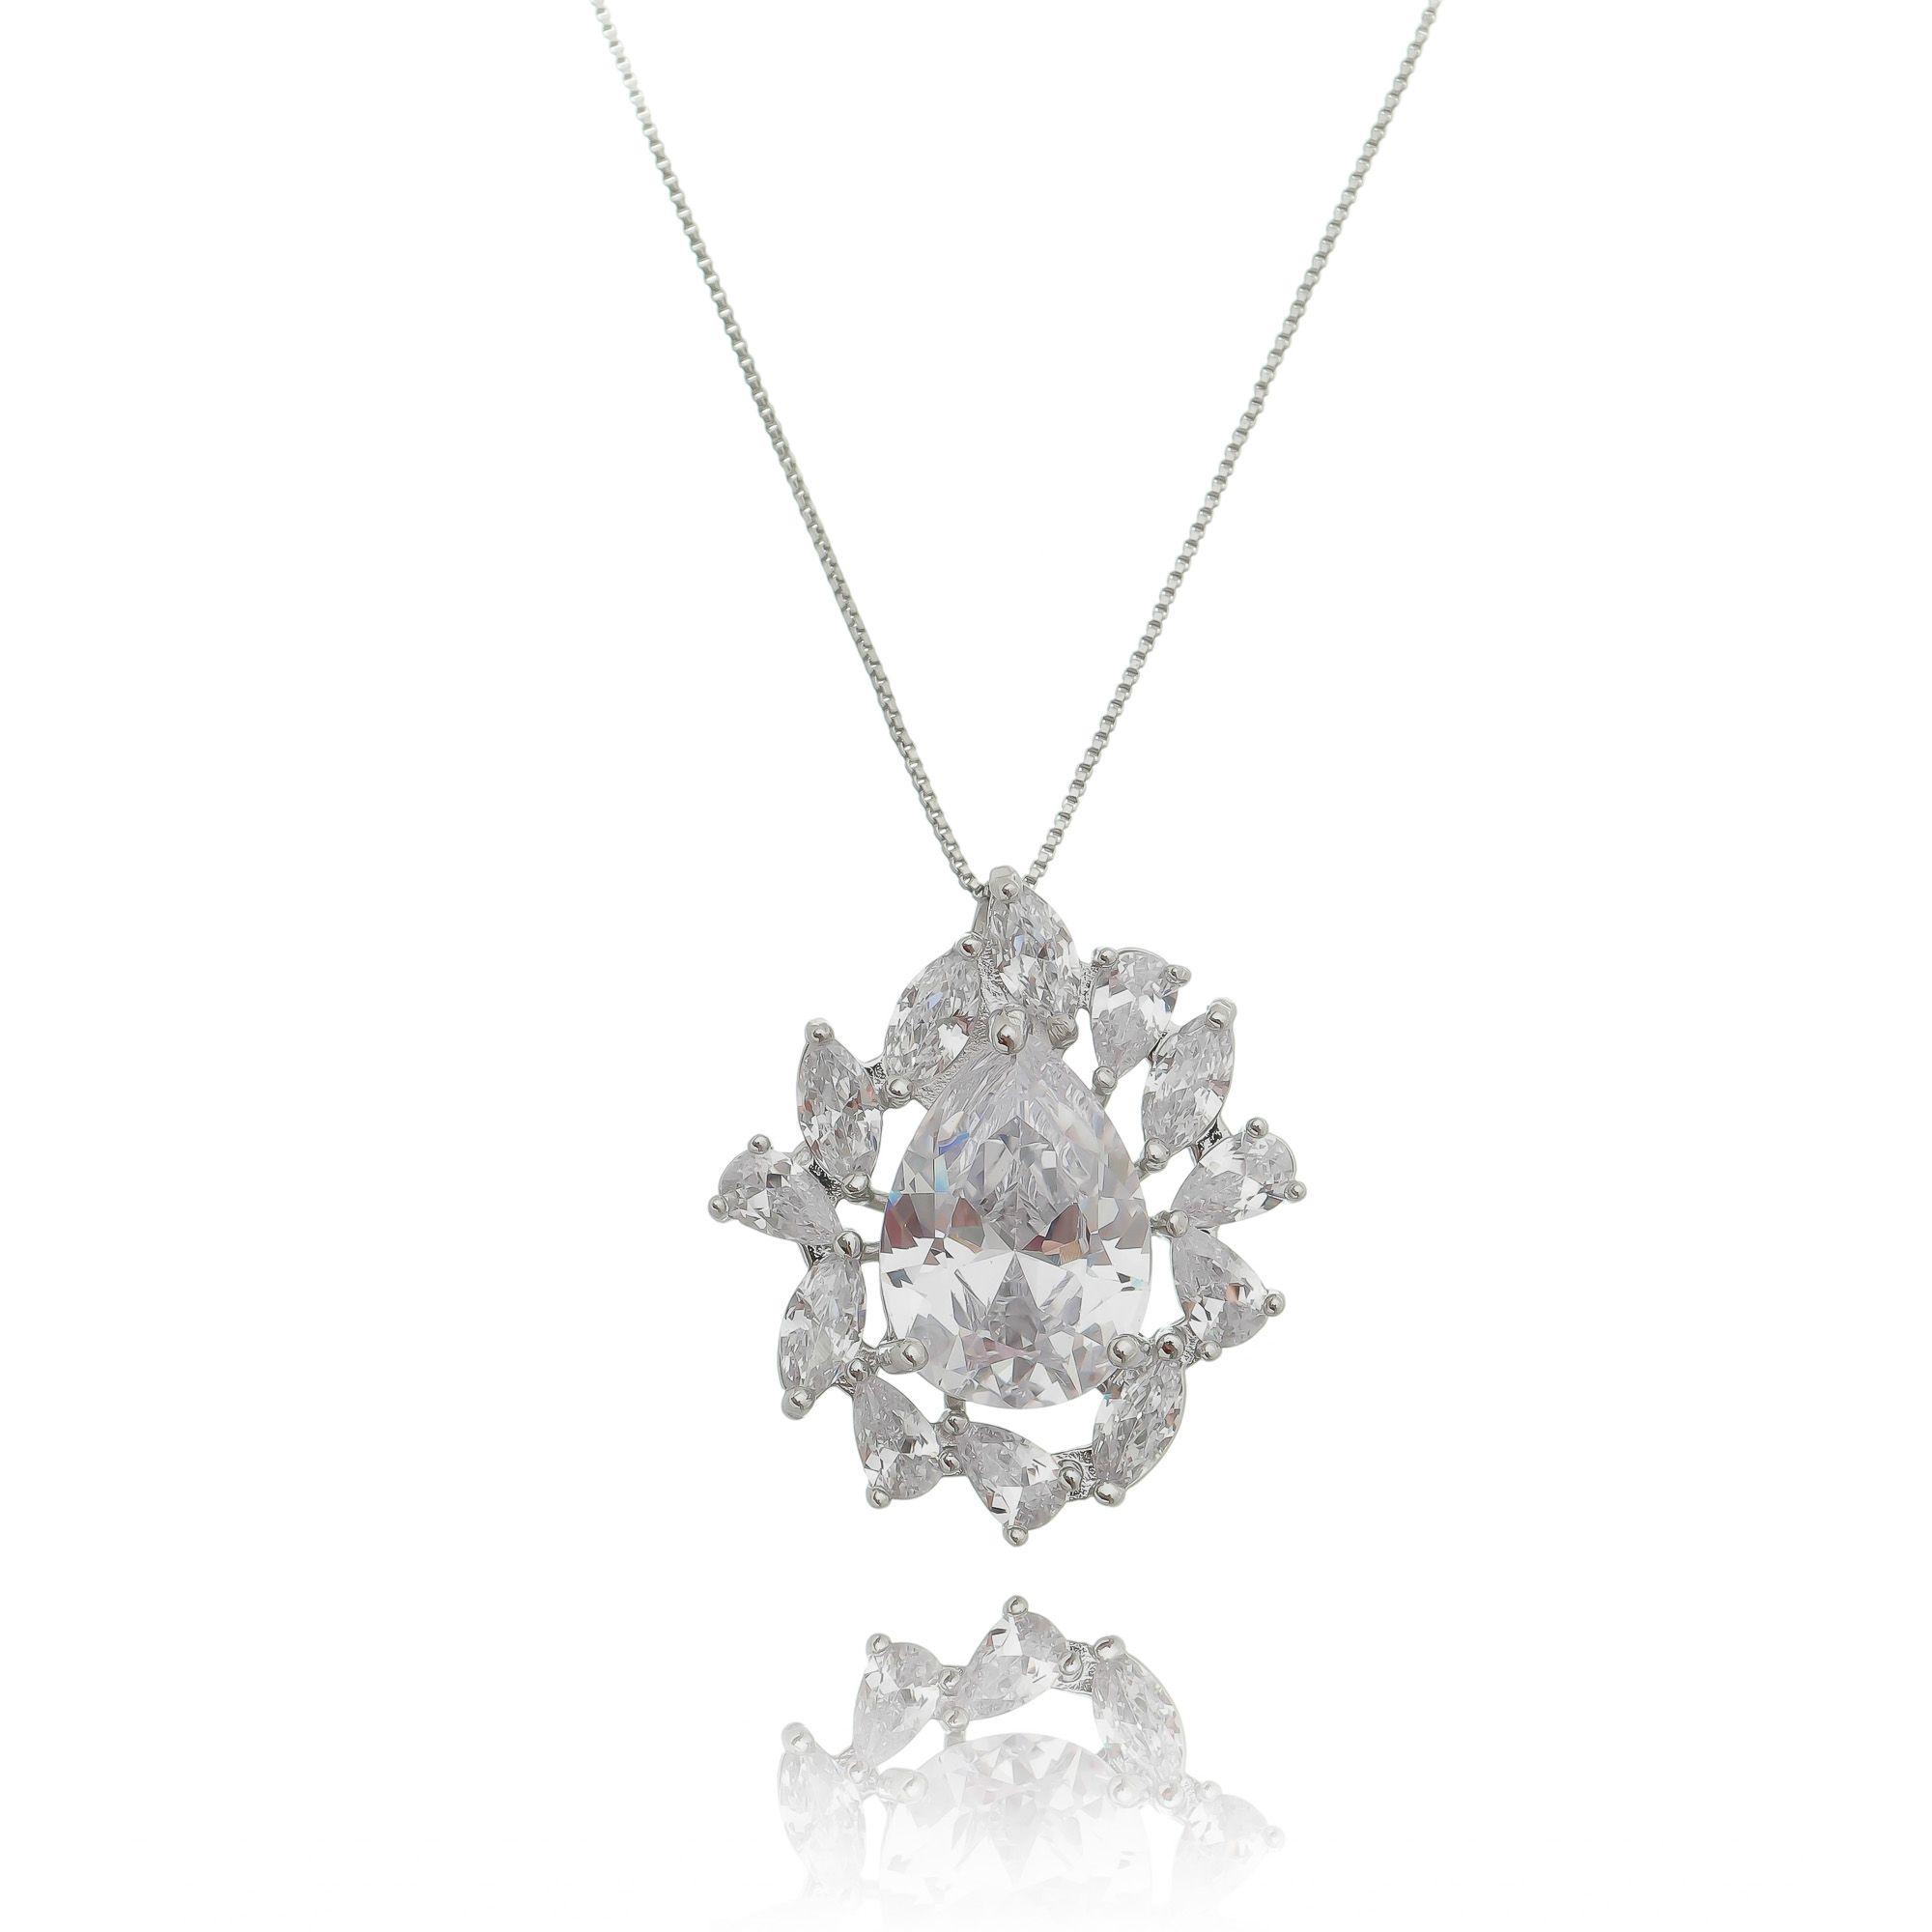 Colar Gota Zircônia Cristal Semijoia Ródio Branco  - Soloyou